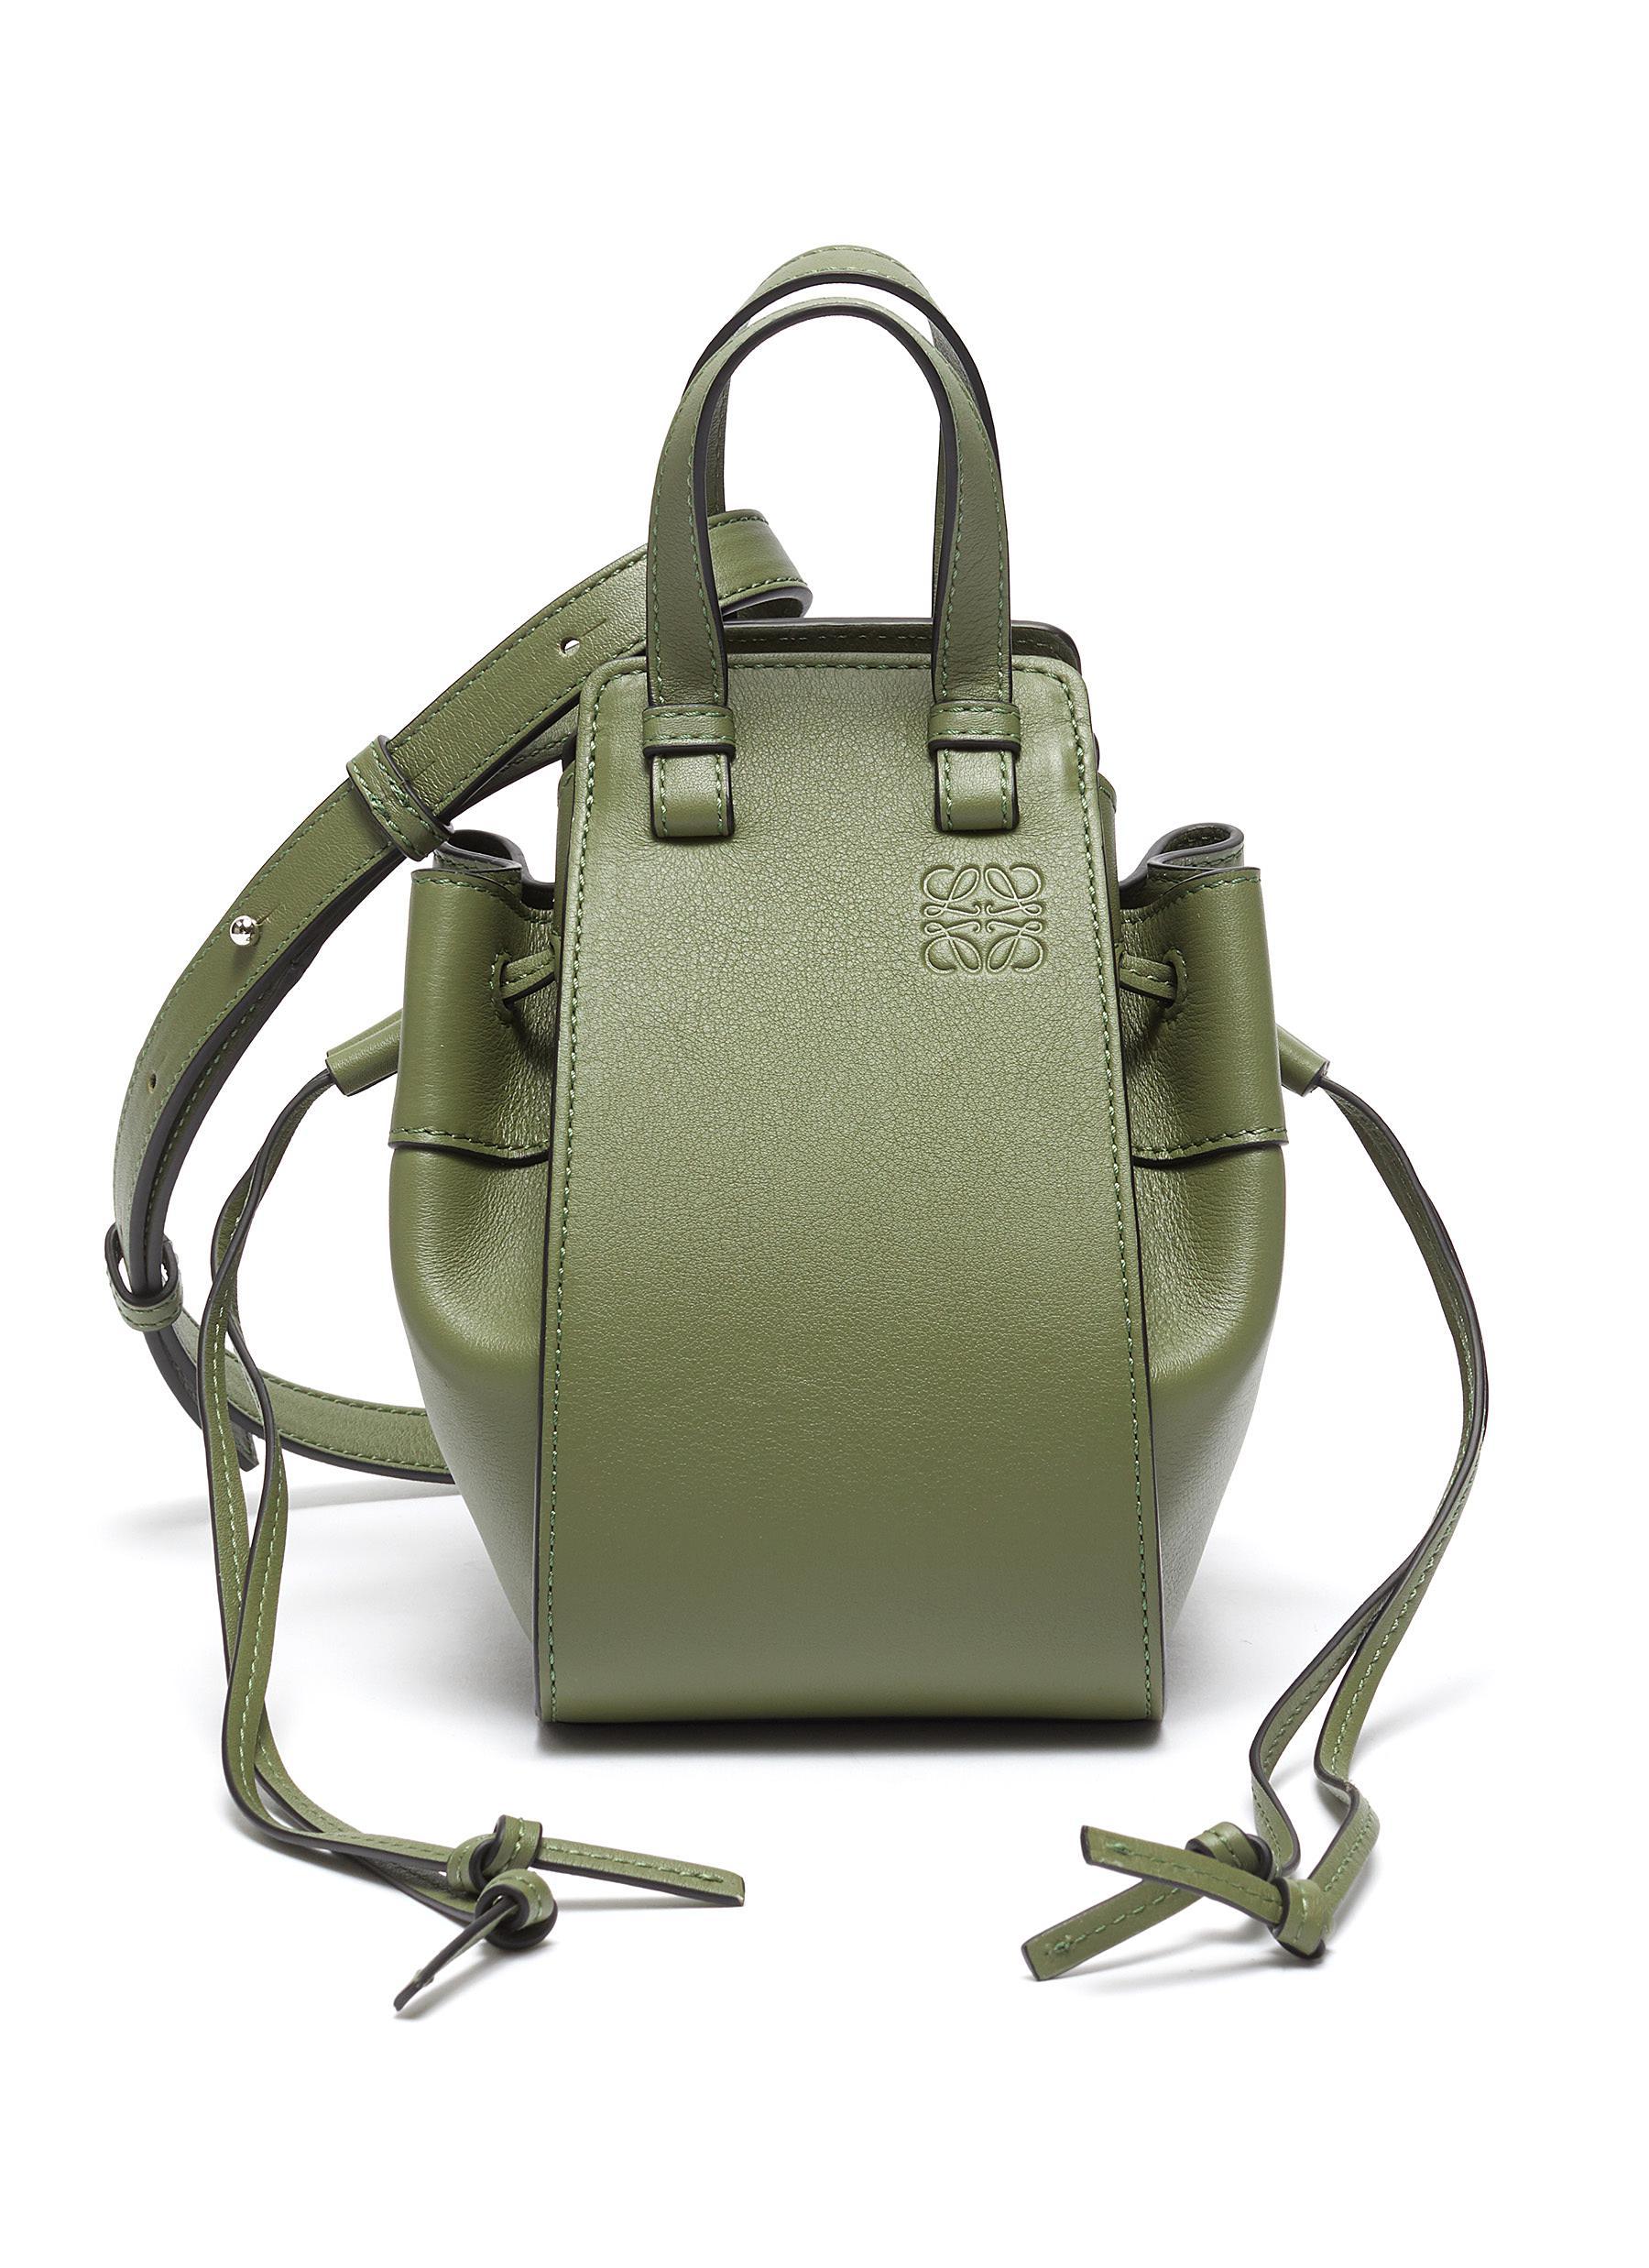 'Mini Hammock' drawstring tote bag